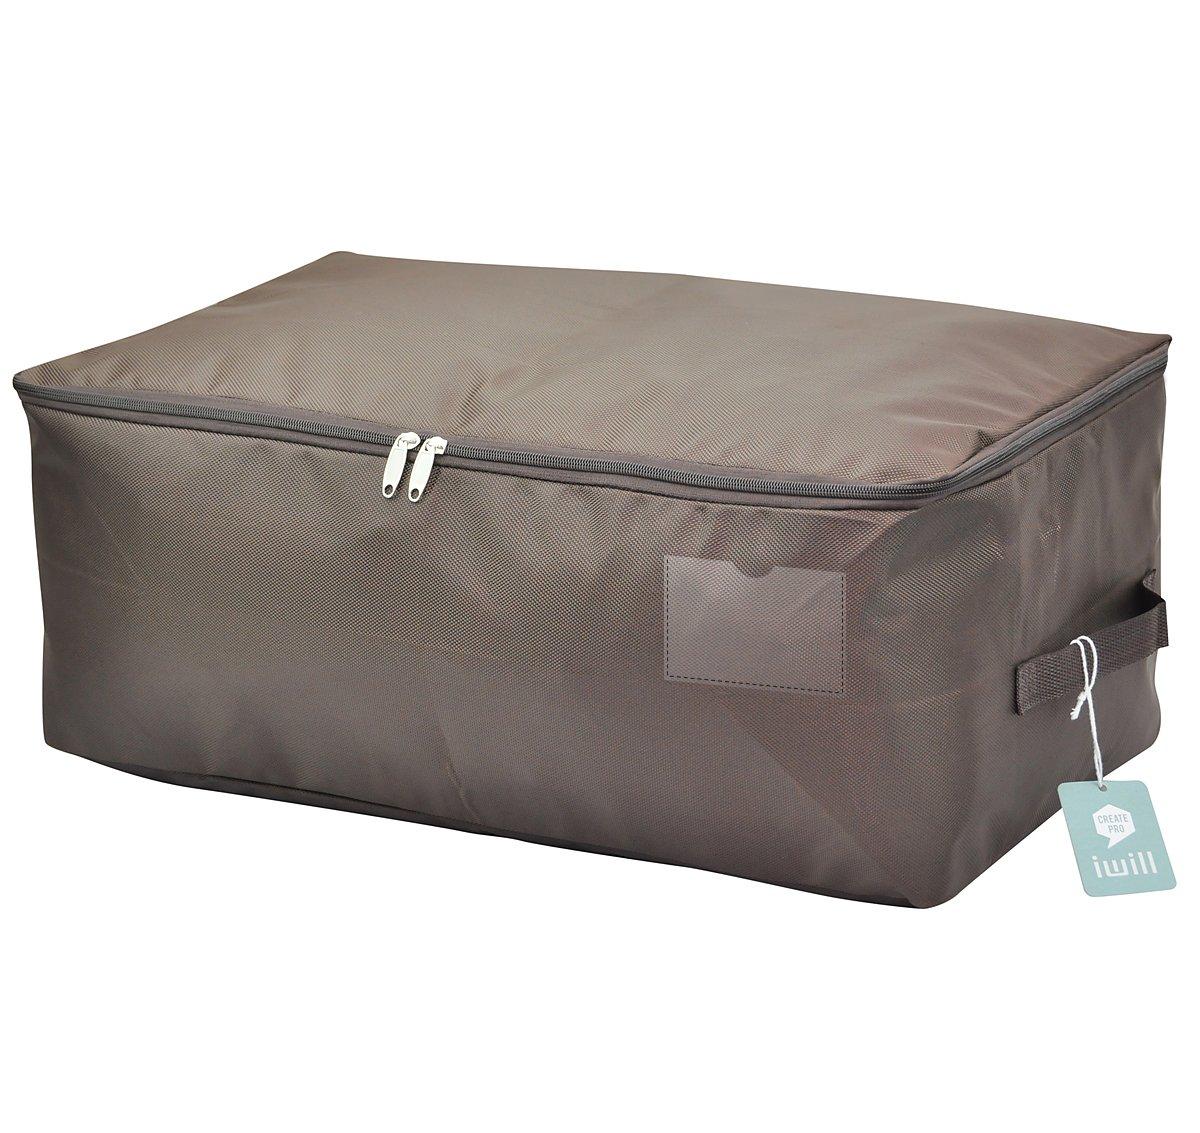 Seasonal Clothes Storage Bag, Comforter/Bedding/Quilt/Pillow Storage Organizer Bag, Black I WILL LSD-Black